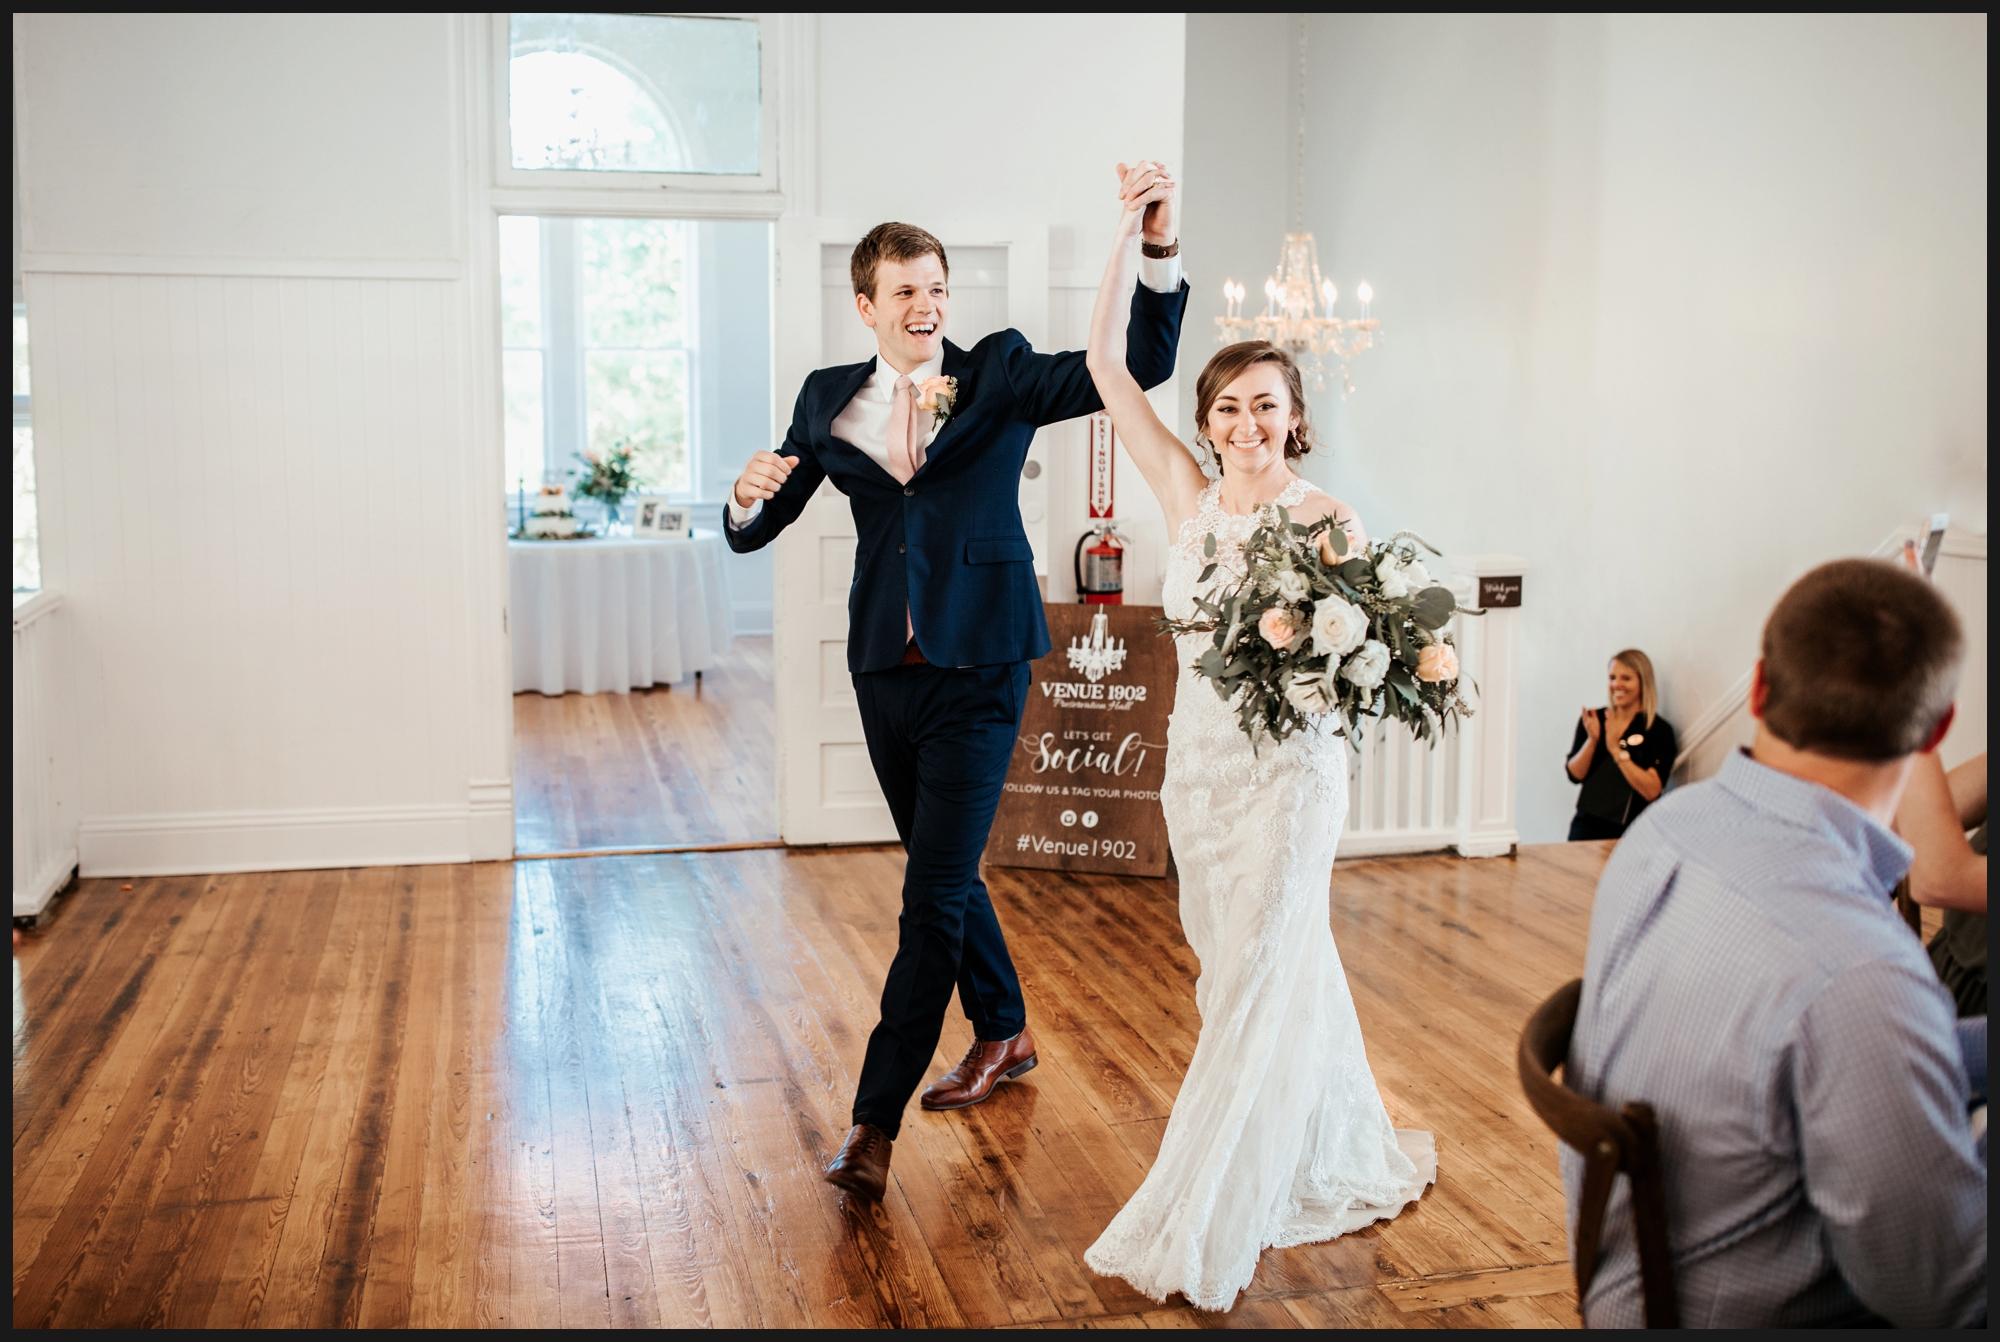 Orlando-Wedding-Photographer-destination-wedding-photographer-florida-wedding-photographer-bohemian-wedding-photographer_1772.jpg